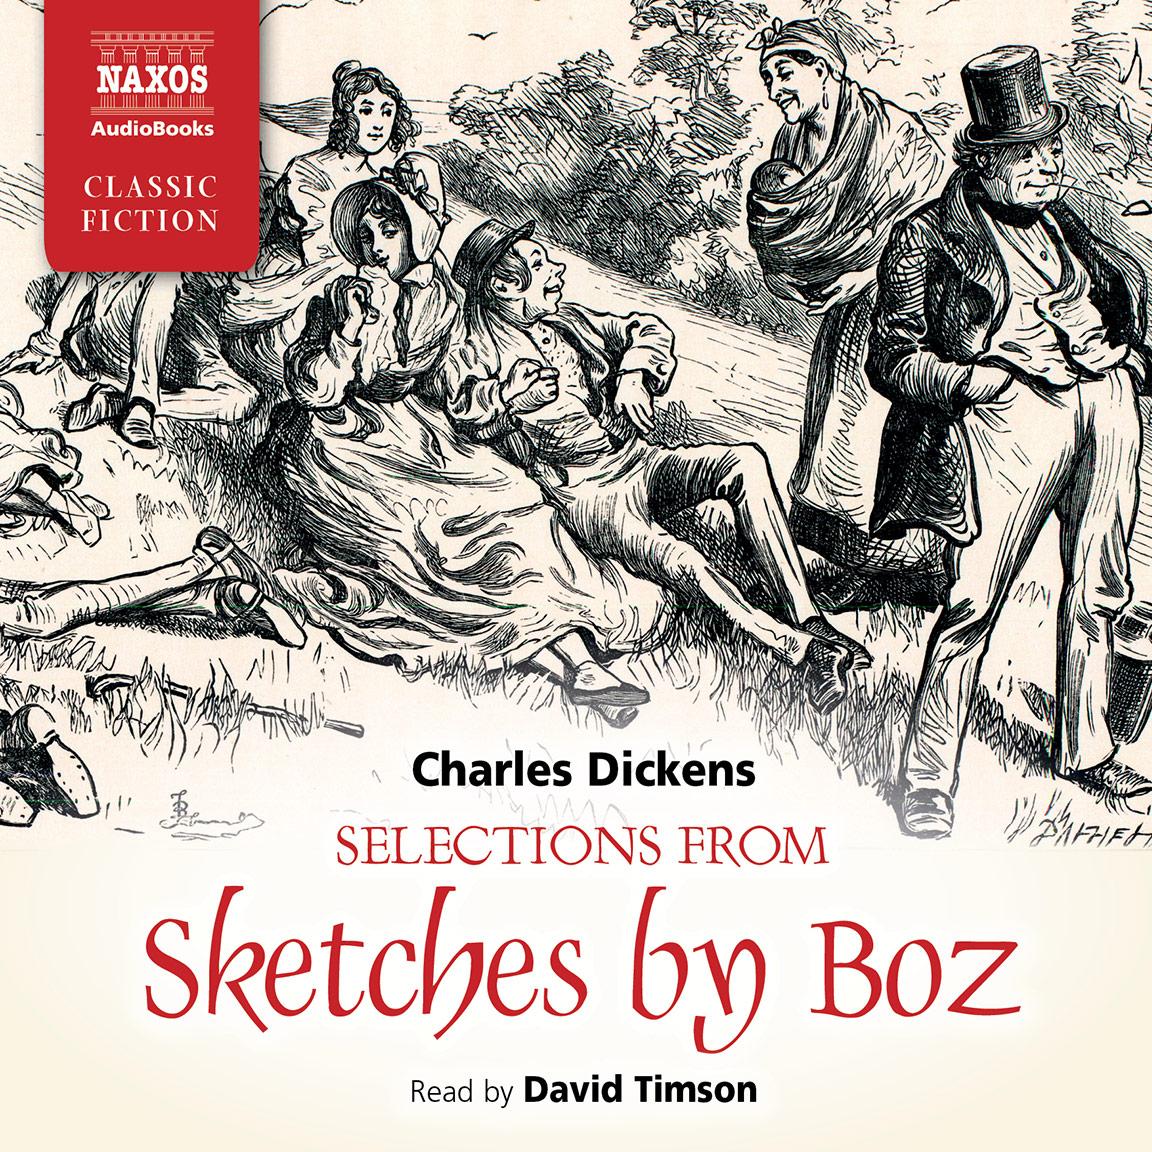 Sketches by Boz (abridged)